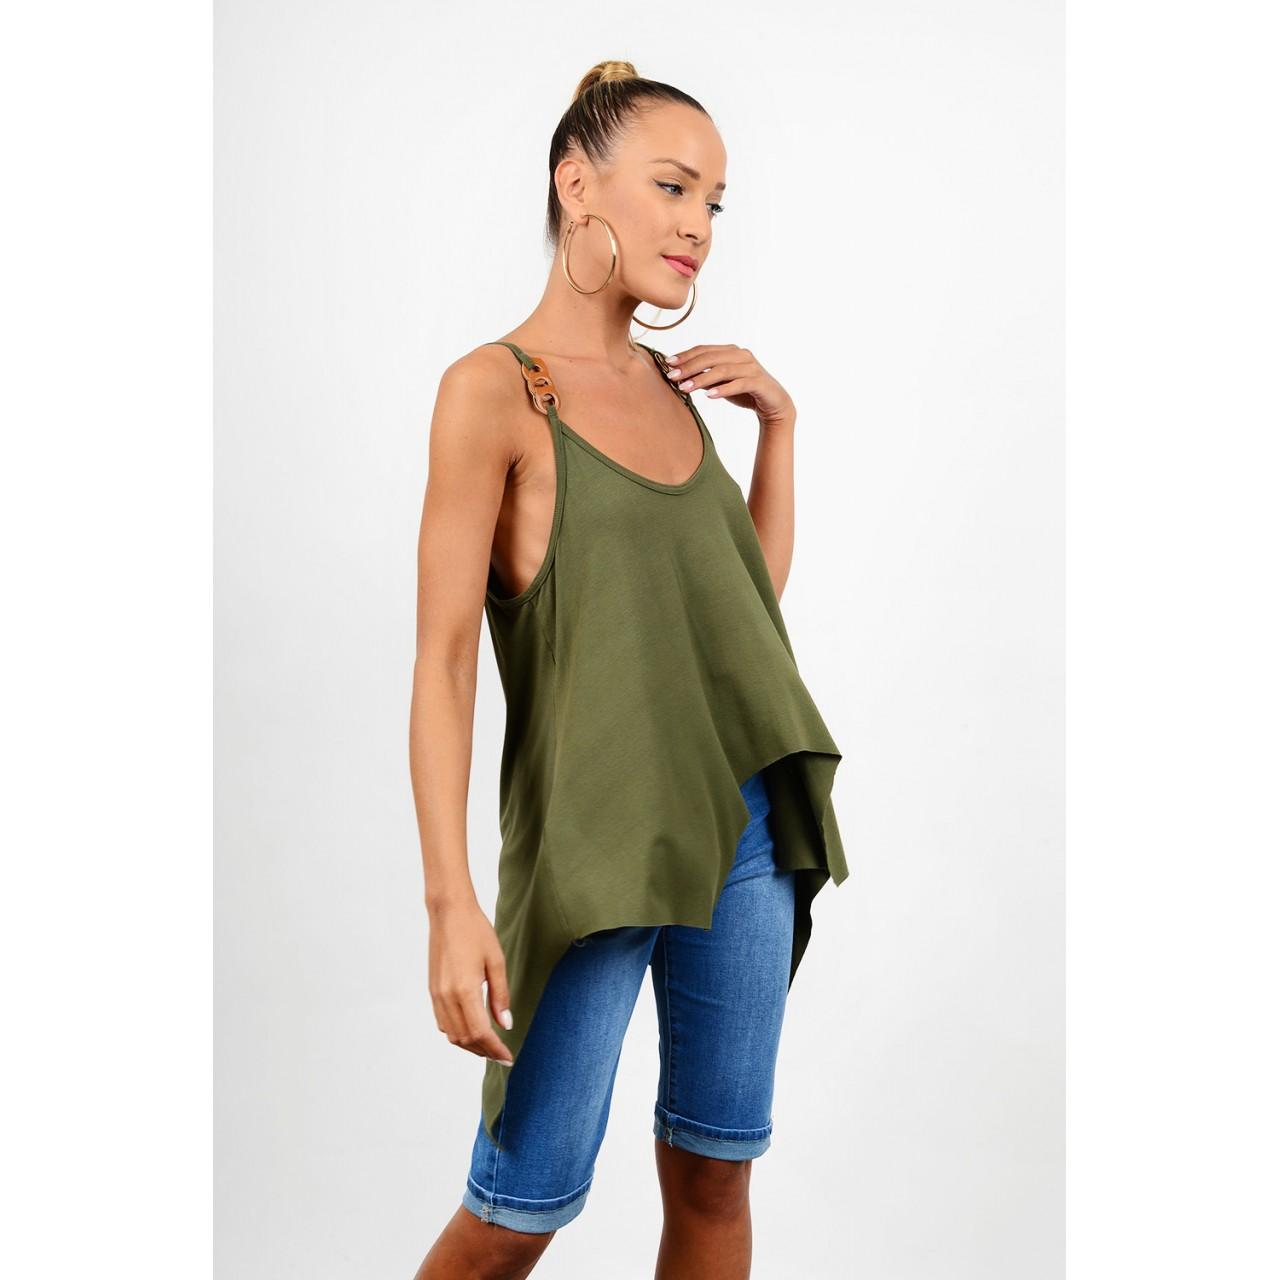 Asymmetrical blouse with straps